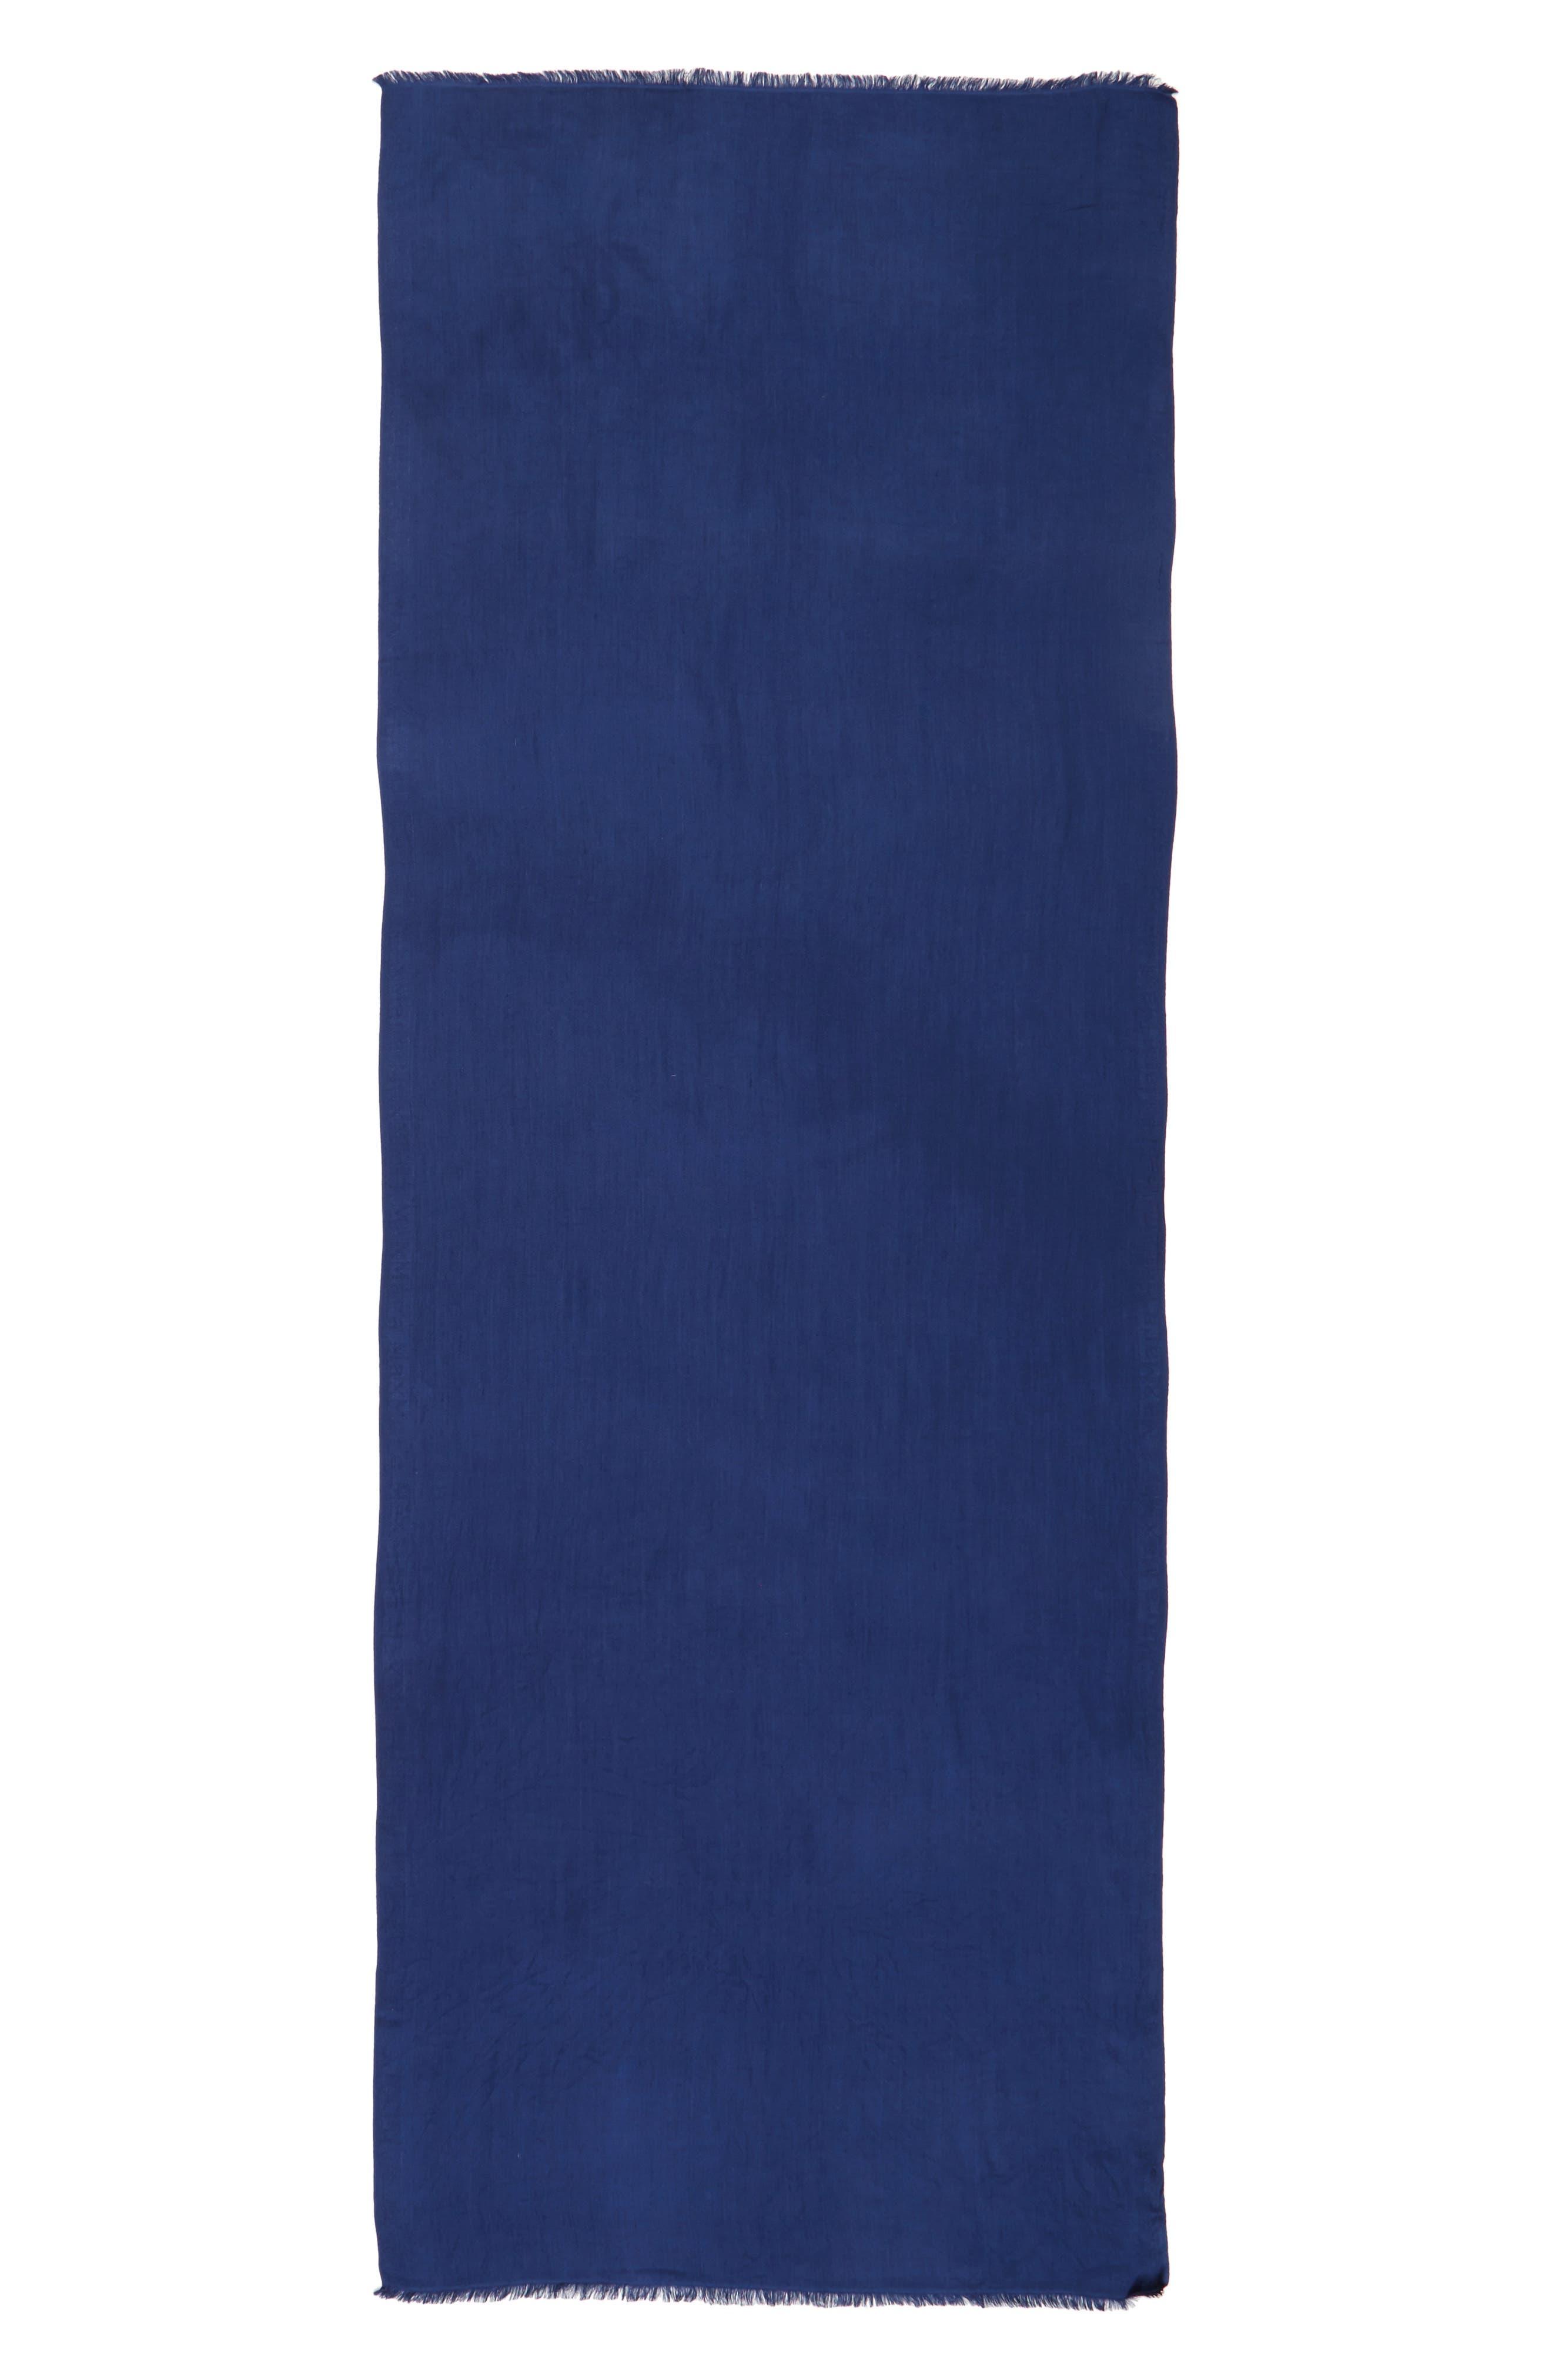 Max Mara Upupa Silk Scarf